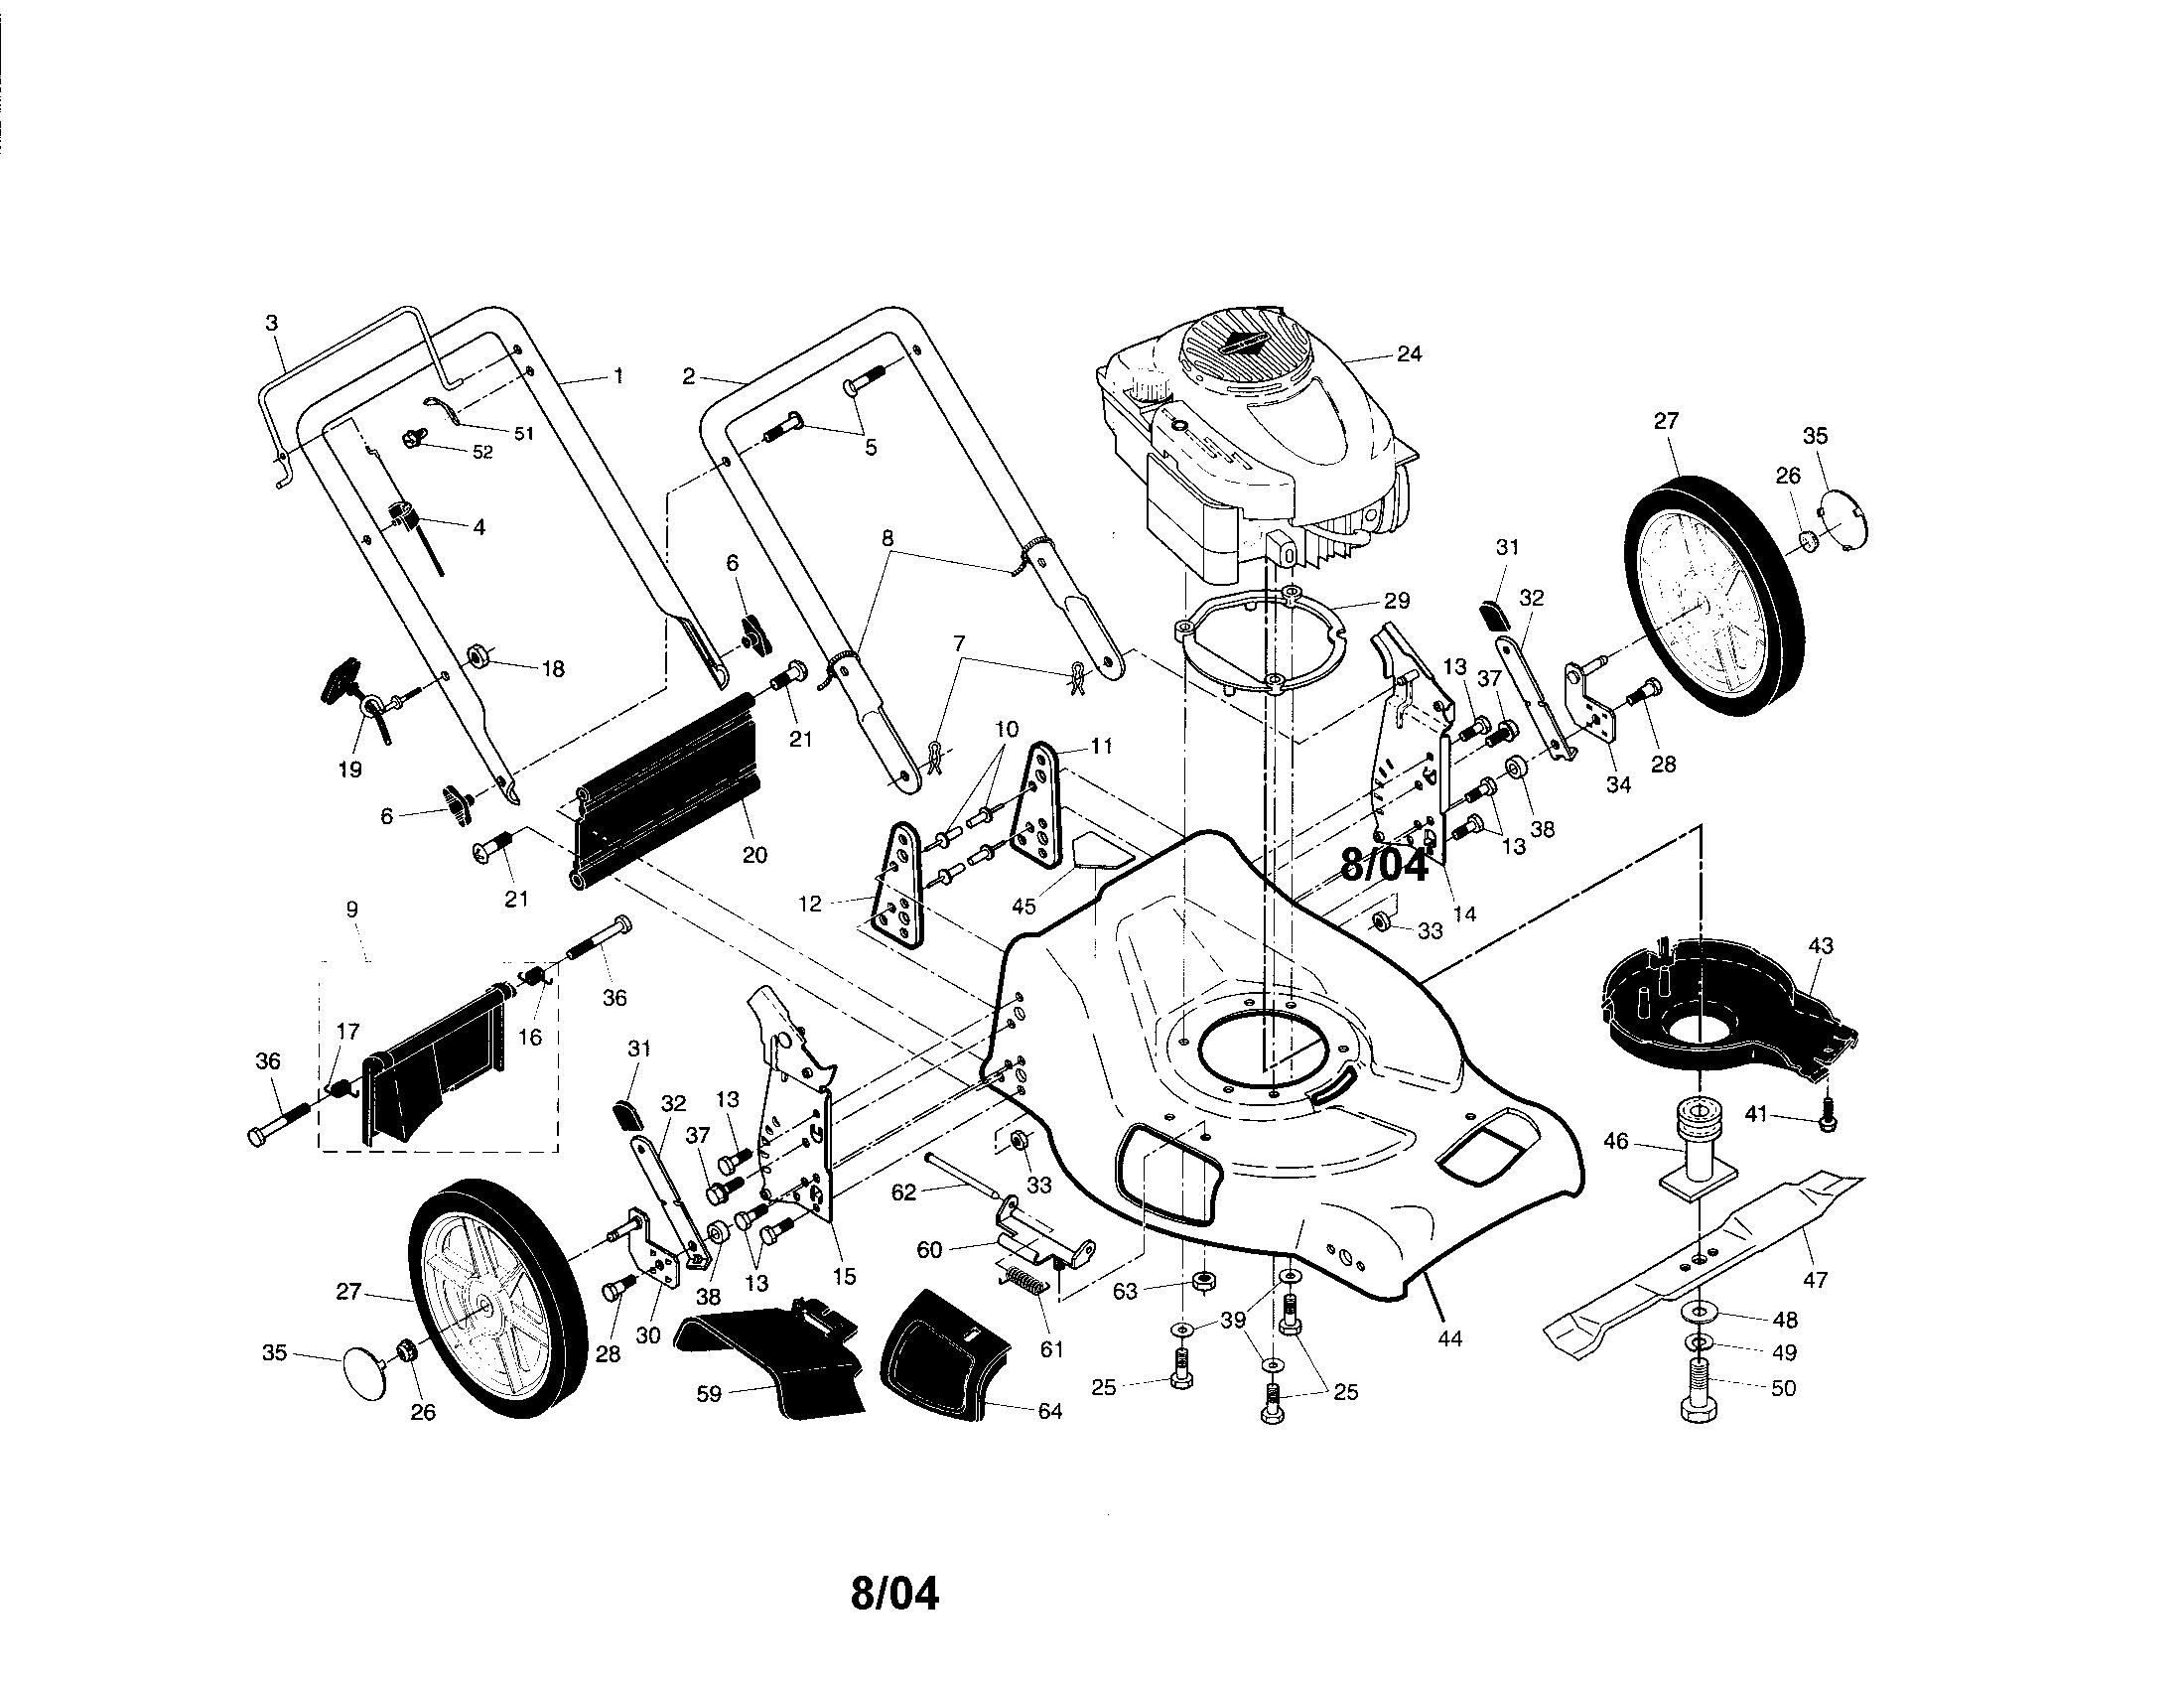 Lesco Walk Behind Mower Parts Diagram, Lesco, Free Engine